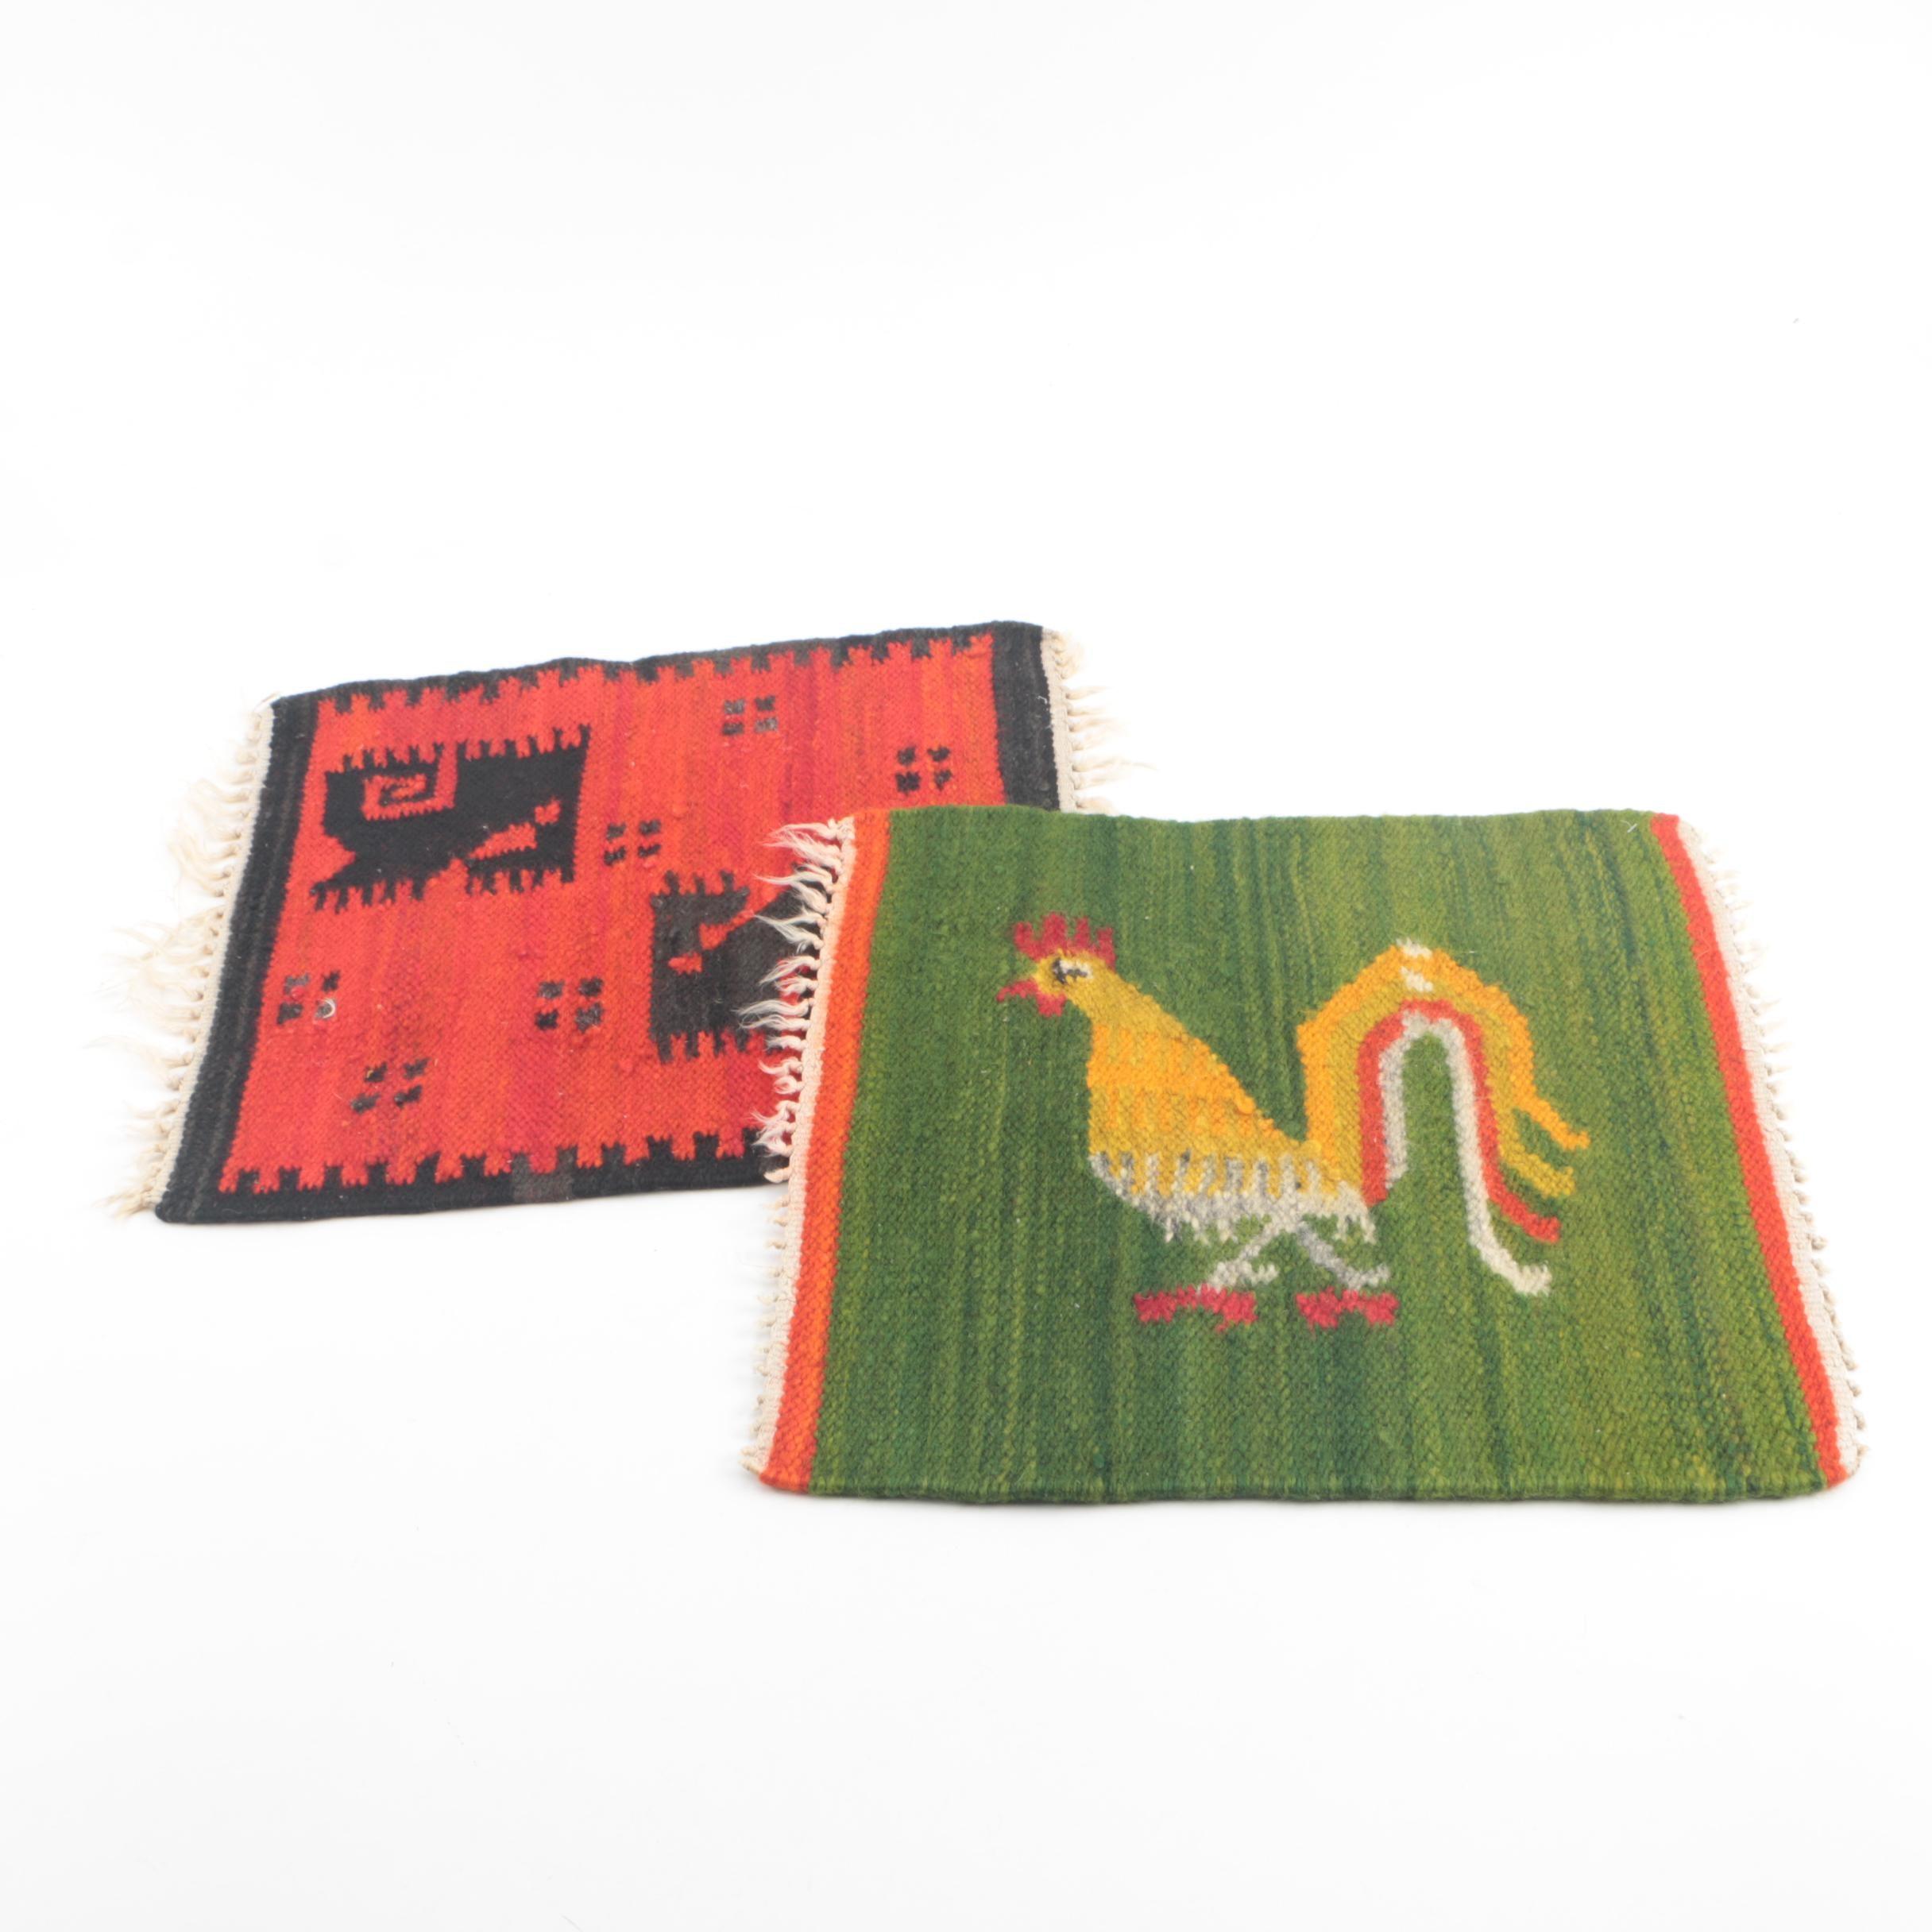 Woven Wool Folk Art Textiles